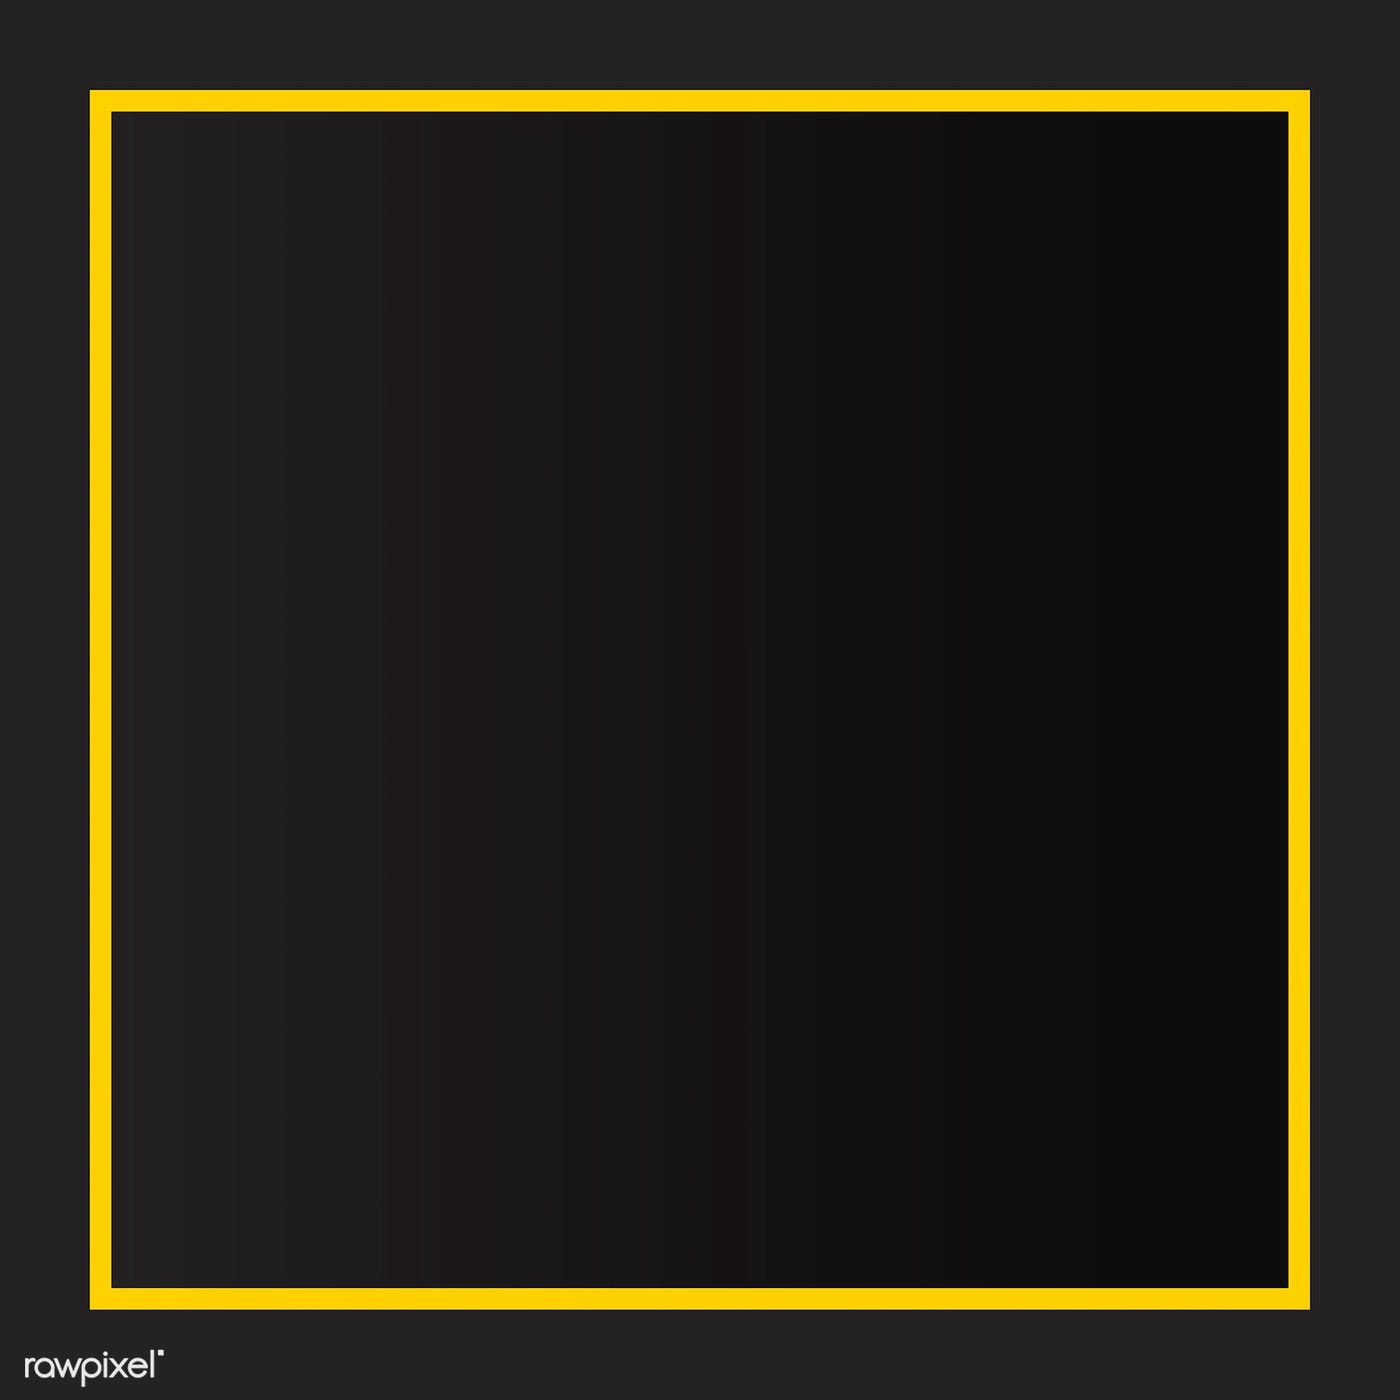 Download Premium Vector Of Yellow Border Black Background Vector 1217009 Black Backgrounds Black Background Design Black Background Wallpaper